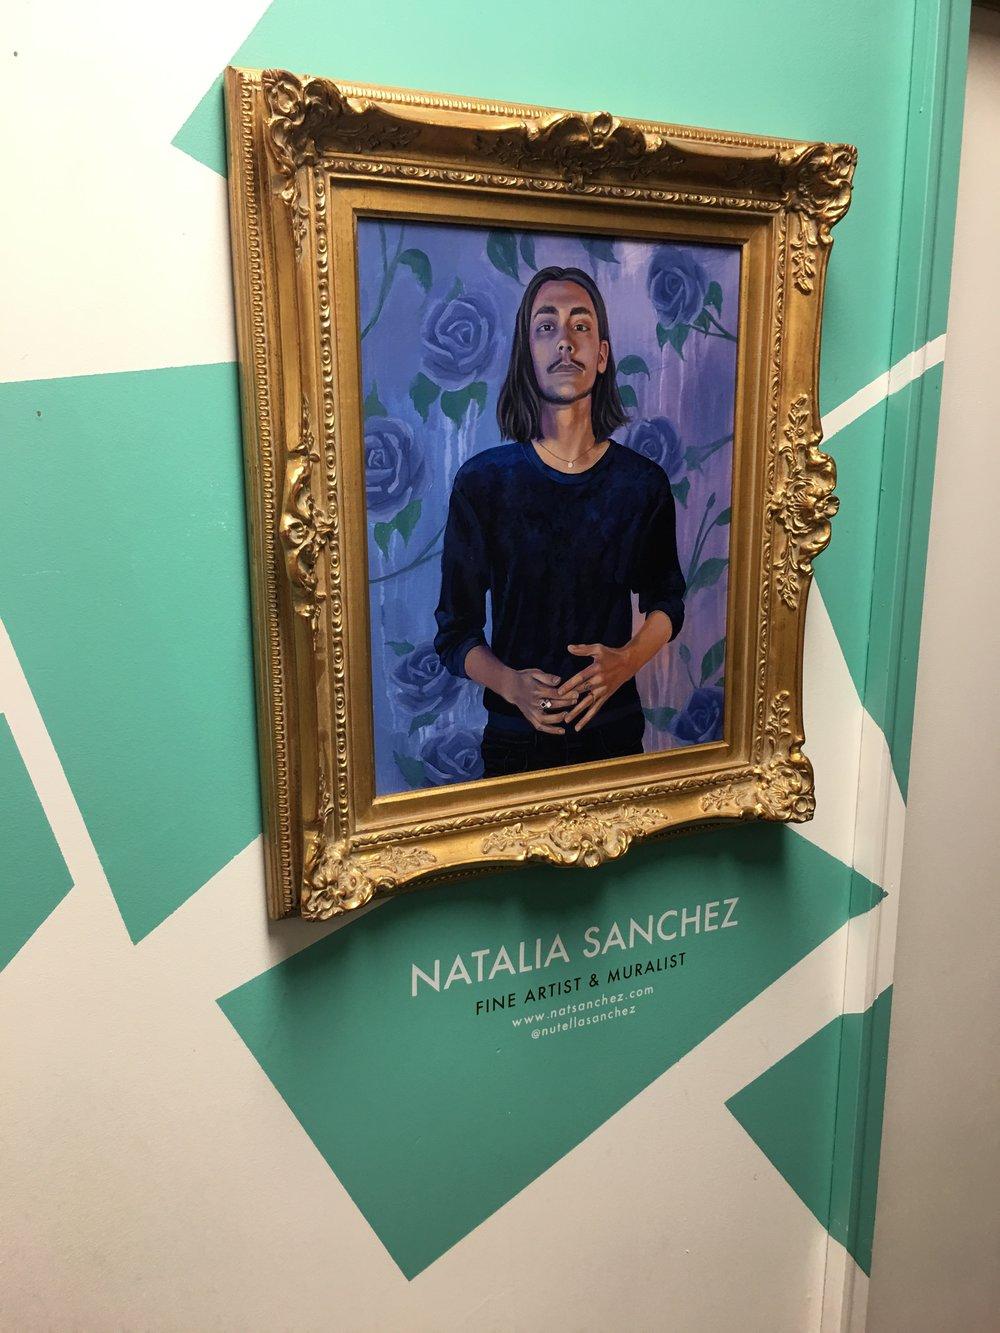 Natalia Sanchez - Fine Artist & Muralist